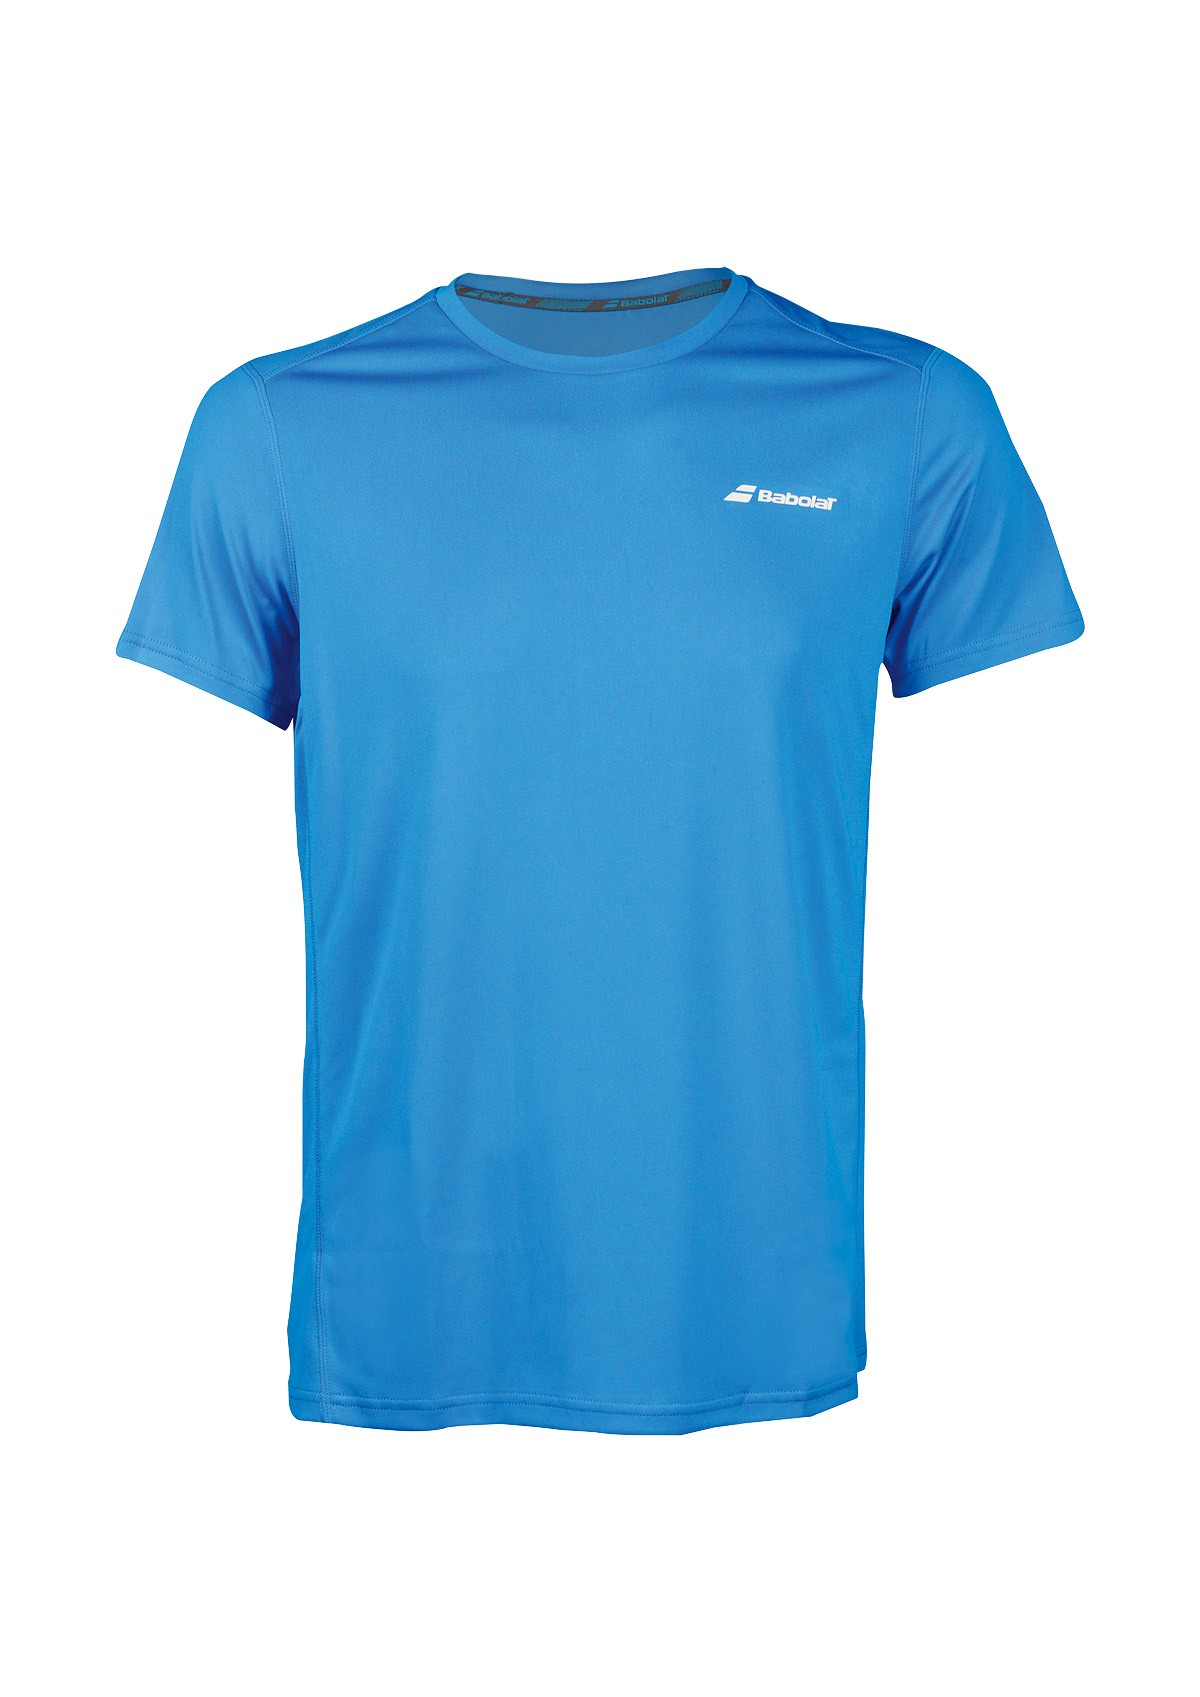 Koszulka tenisowa chłopięca Babolat CORE T-shirt Blue -45%